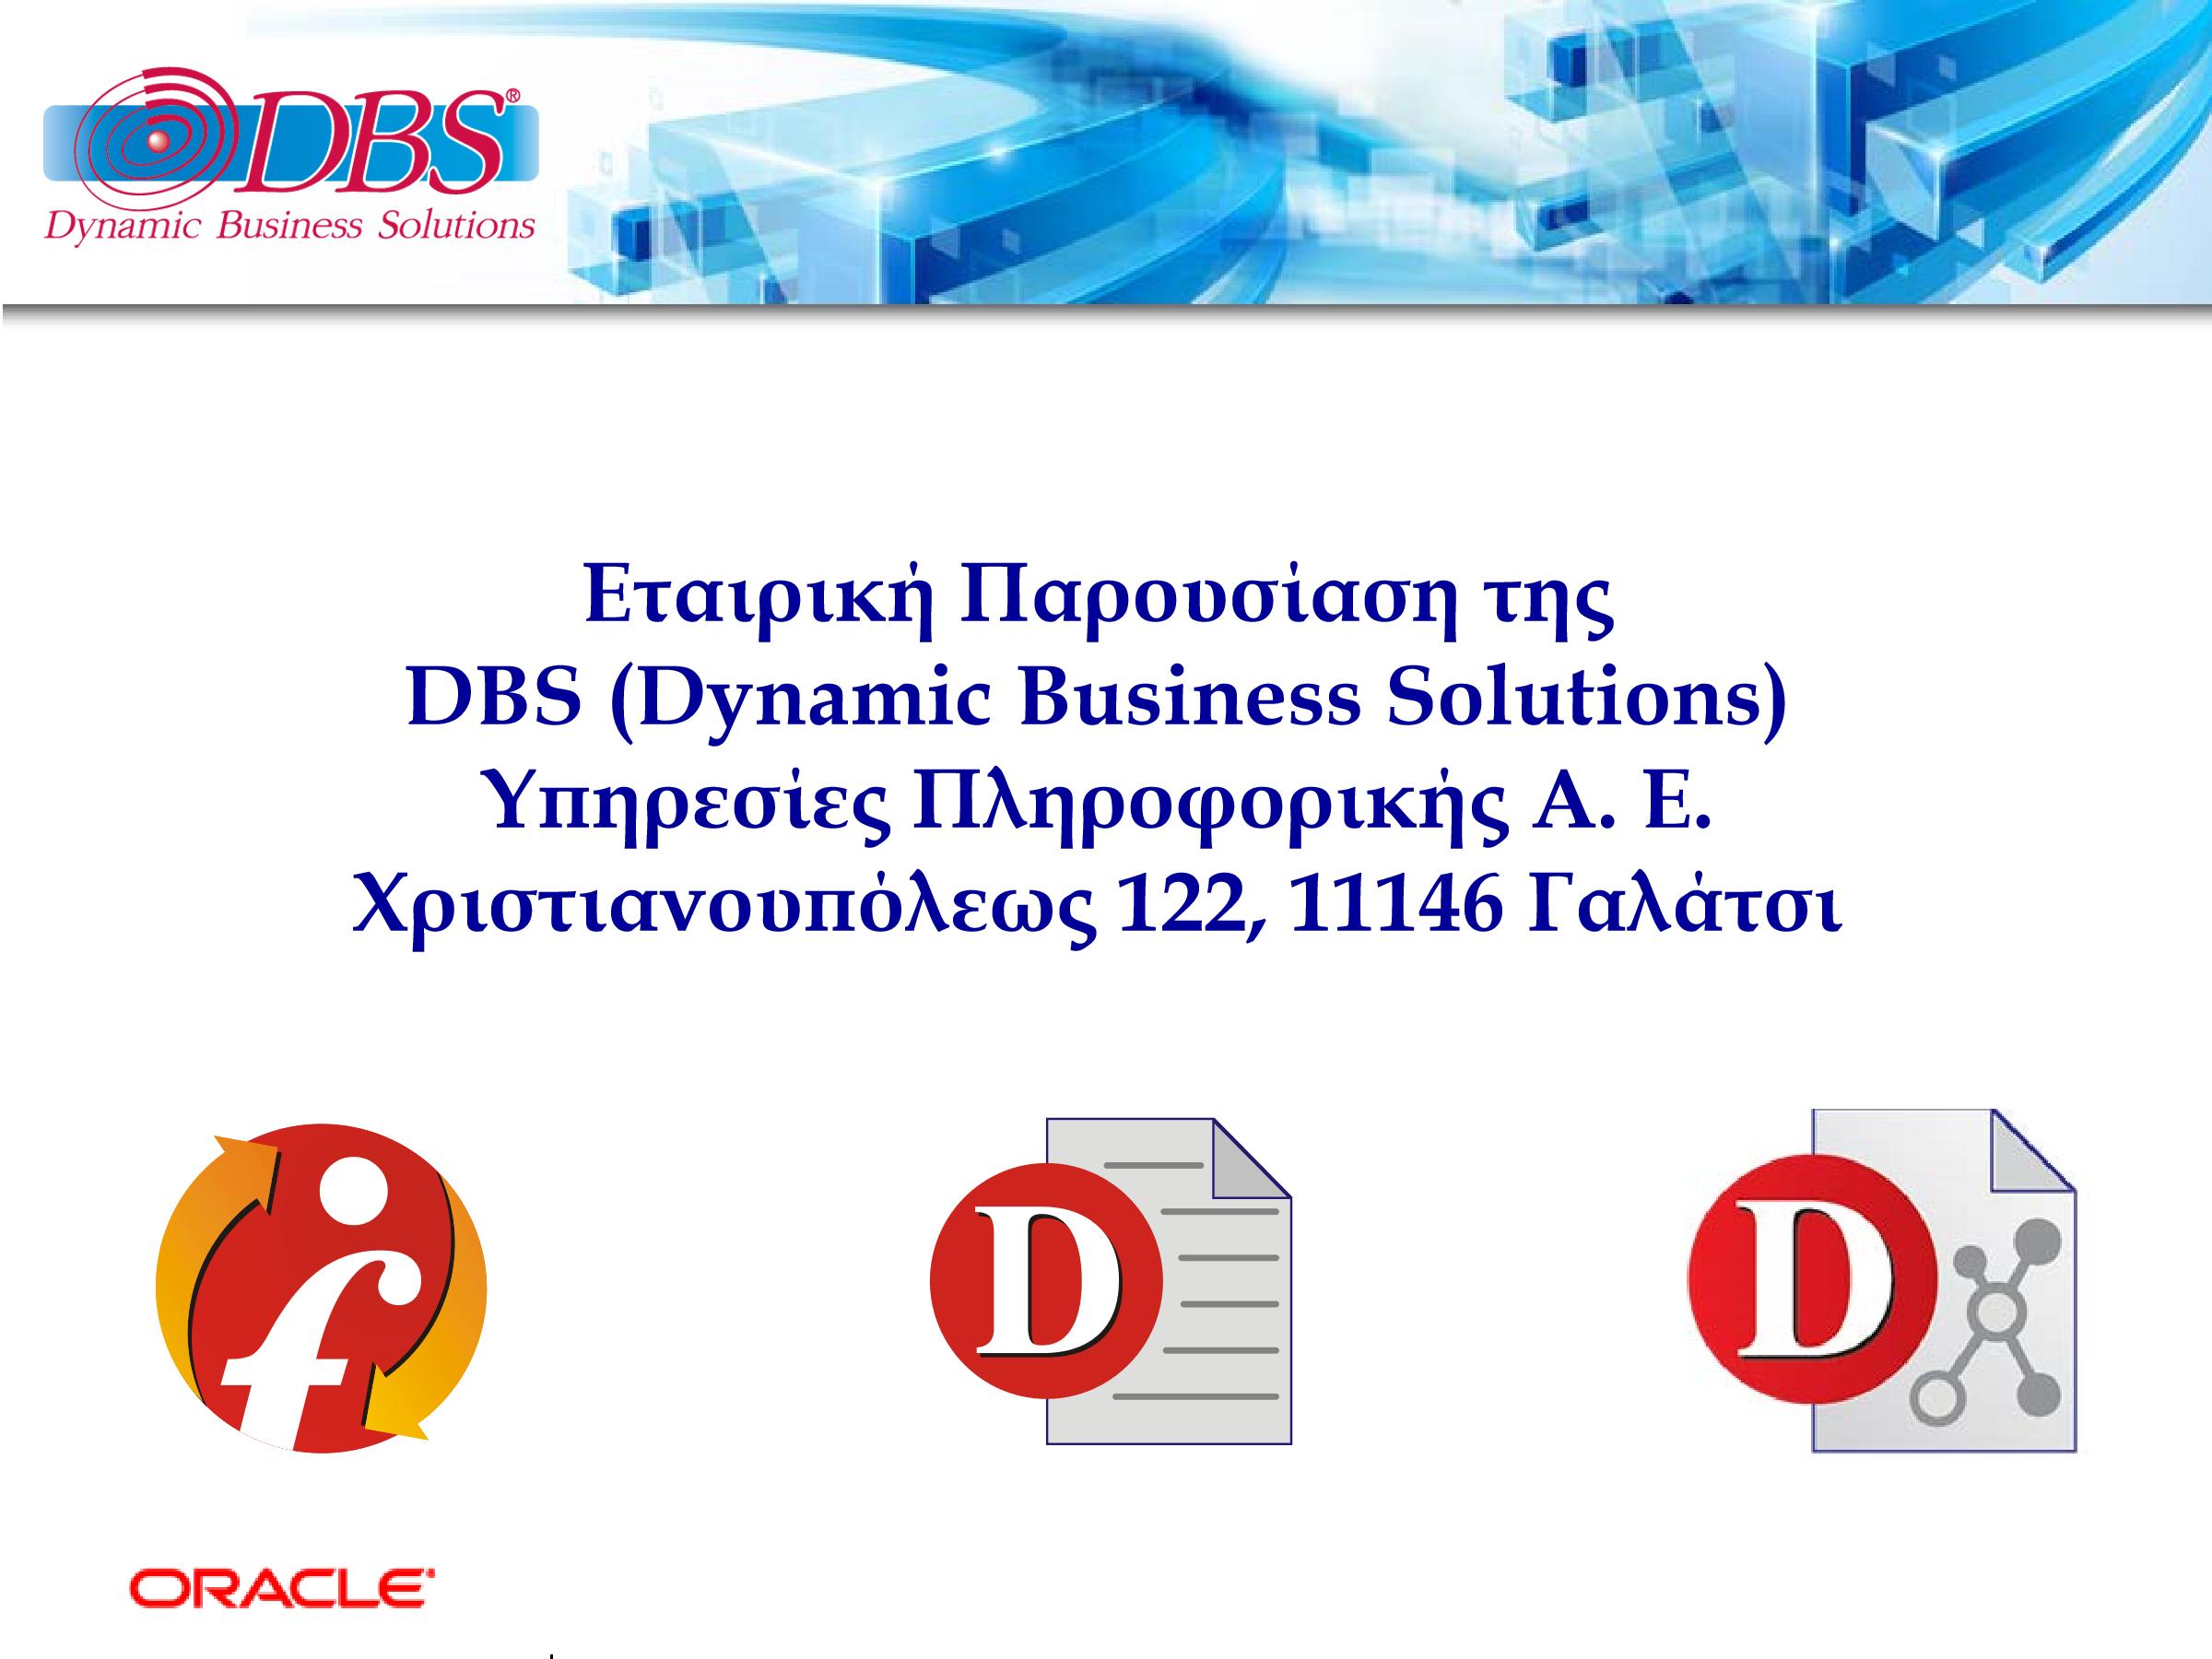 DBSDEMO2019_COMPANY_PROFILE_V18_R26FB-EL-1